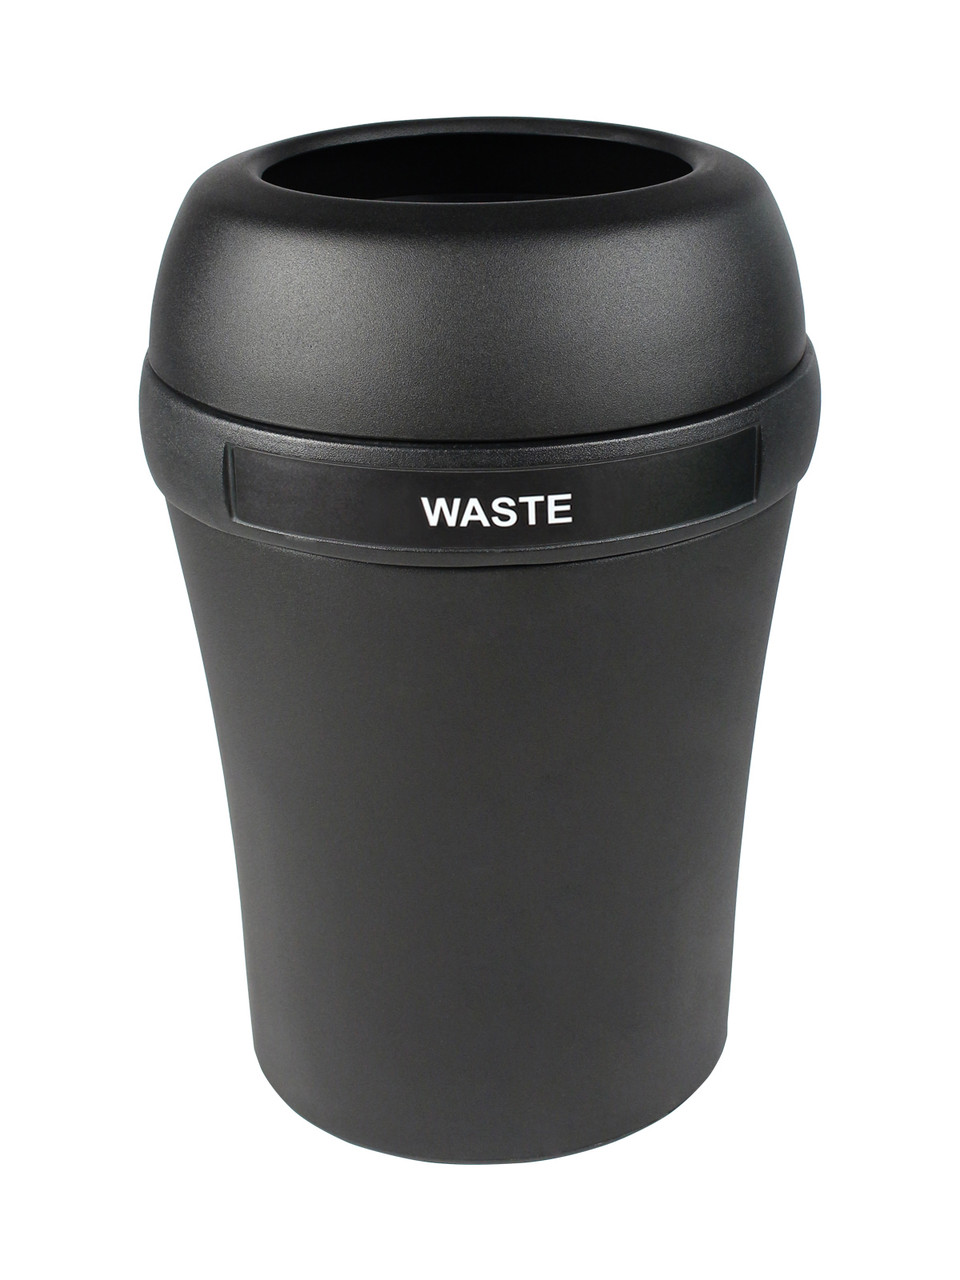 Waste-Black/Black-Full